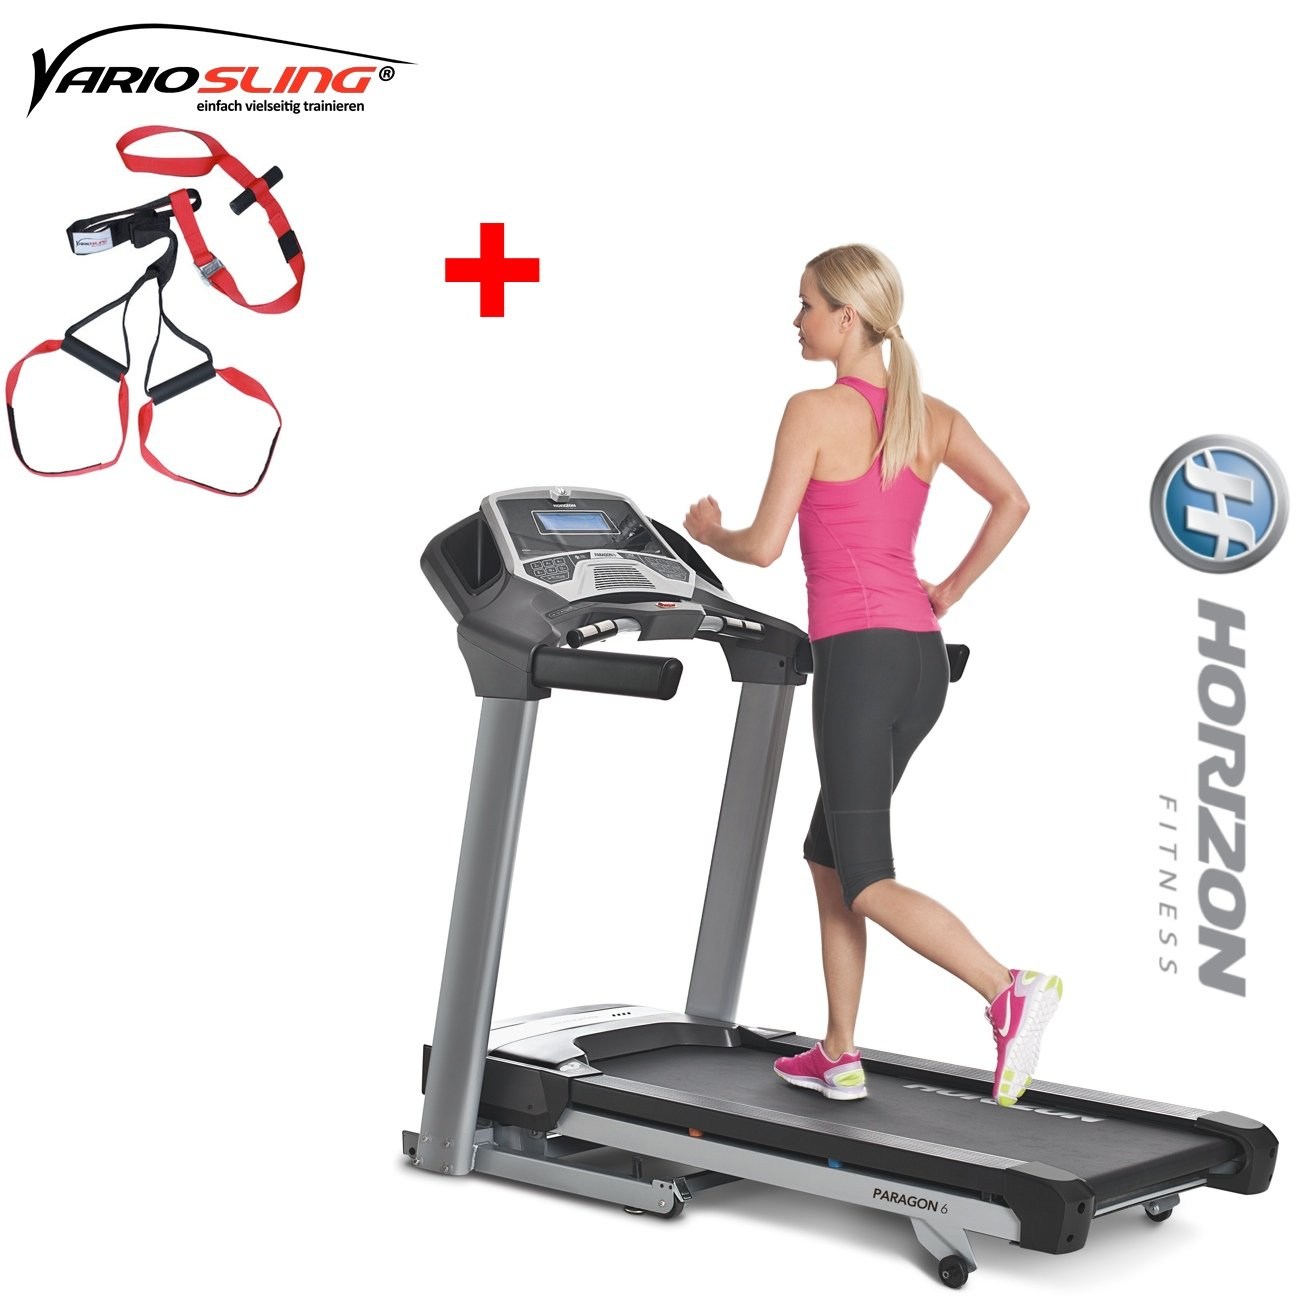 Horizon Cinta de Correr Fitness Paragon 6 Fitness Dispositivo ...